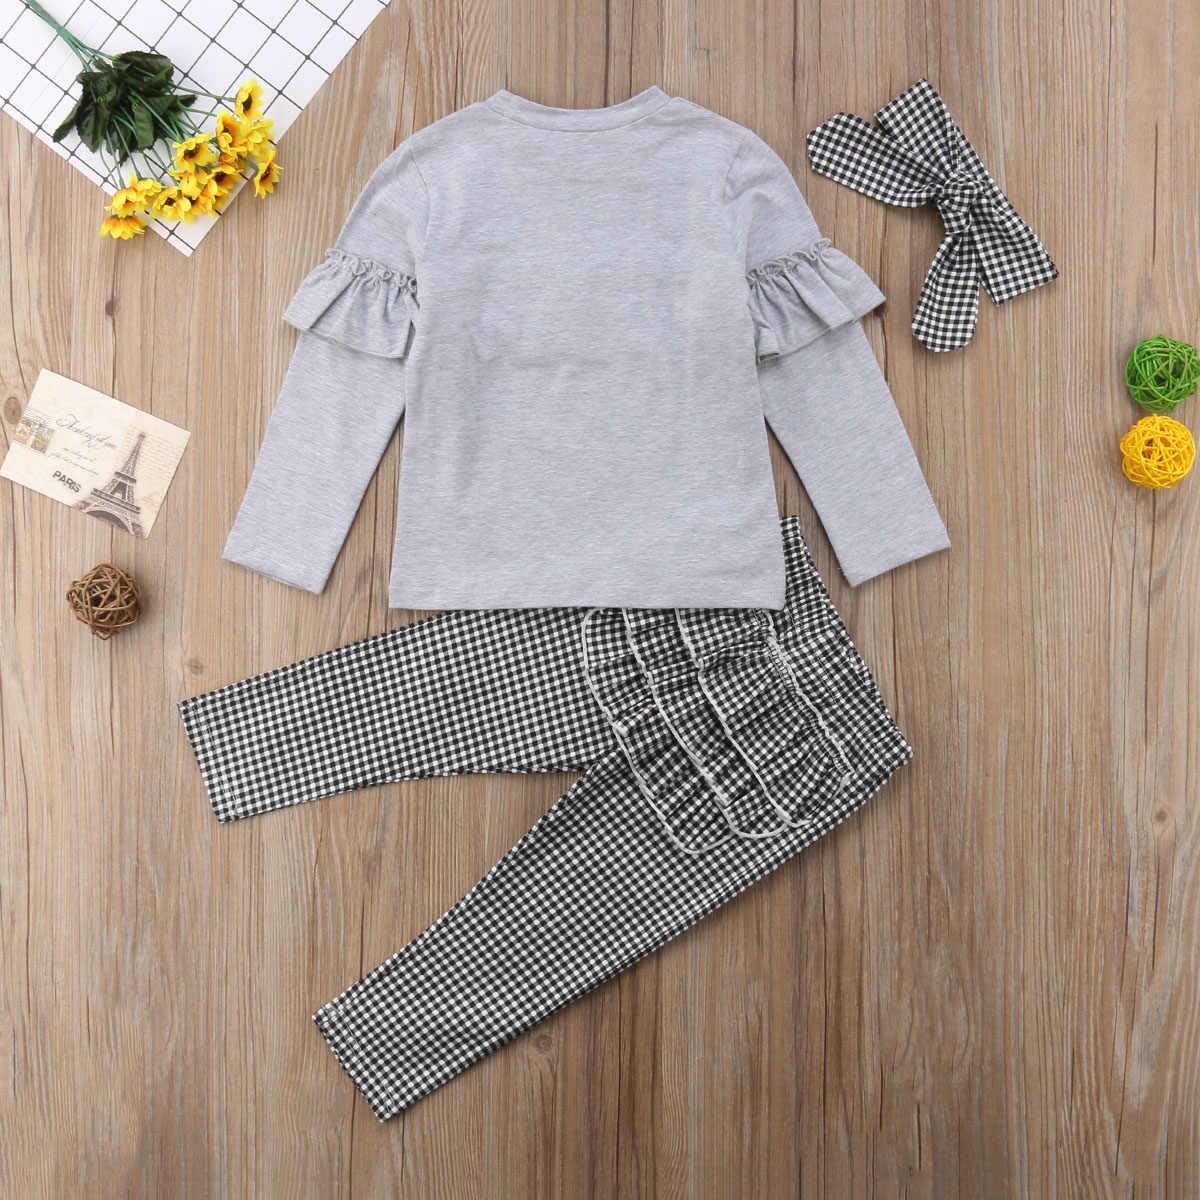 fab5491f95453 ... Toddler Kids Baby Girl Outfits 3PCS Ruffle Long Sleeve Tops+Plaid Pants  Leggings+Headband